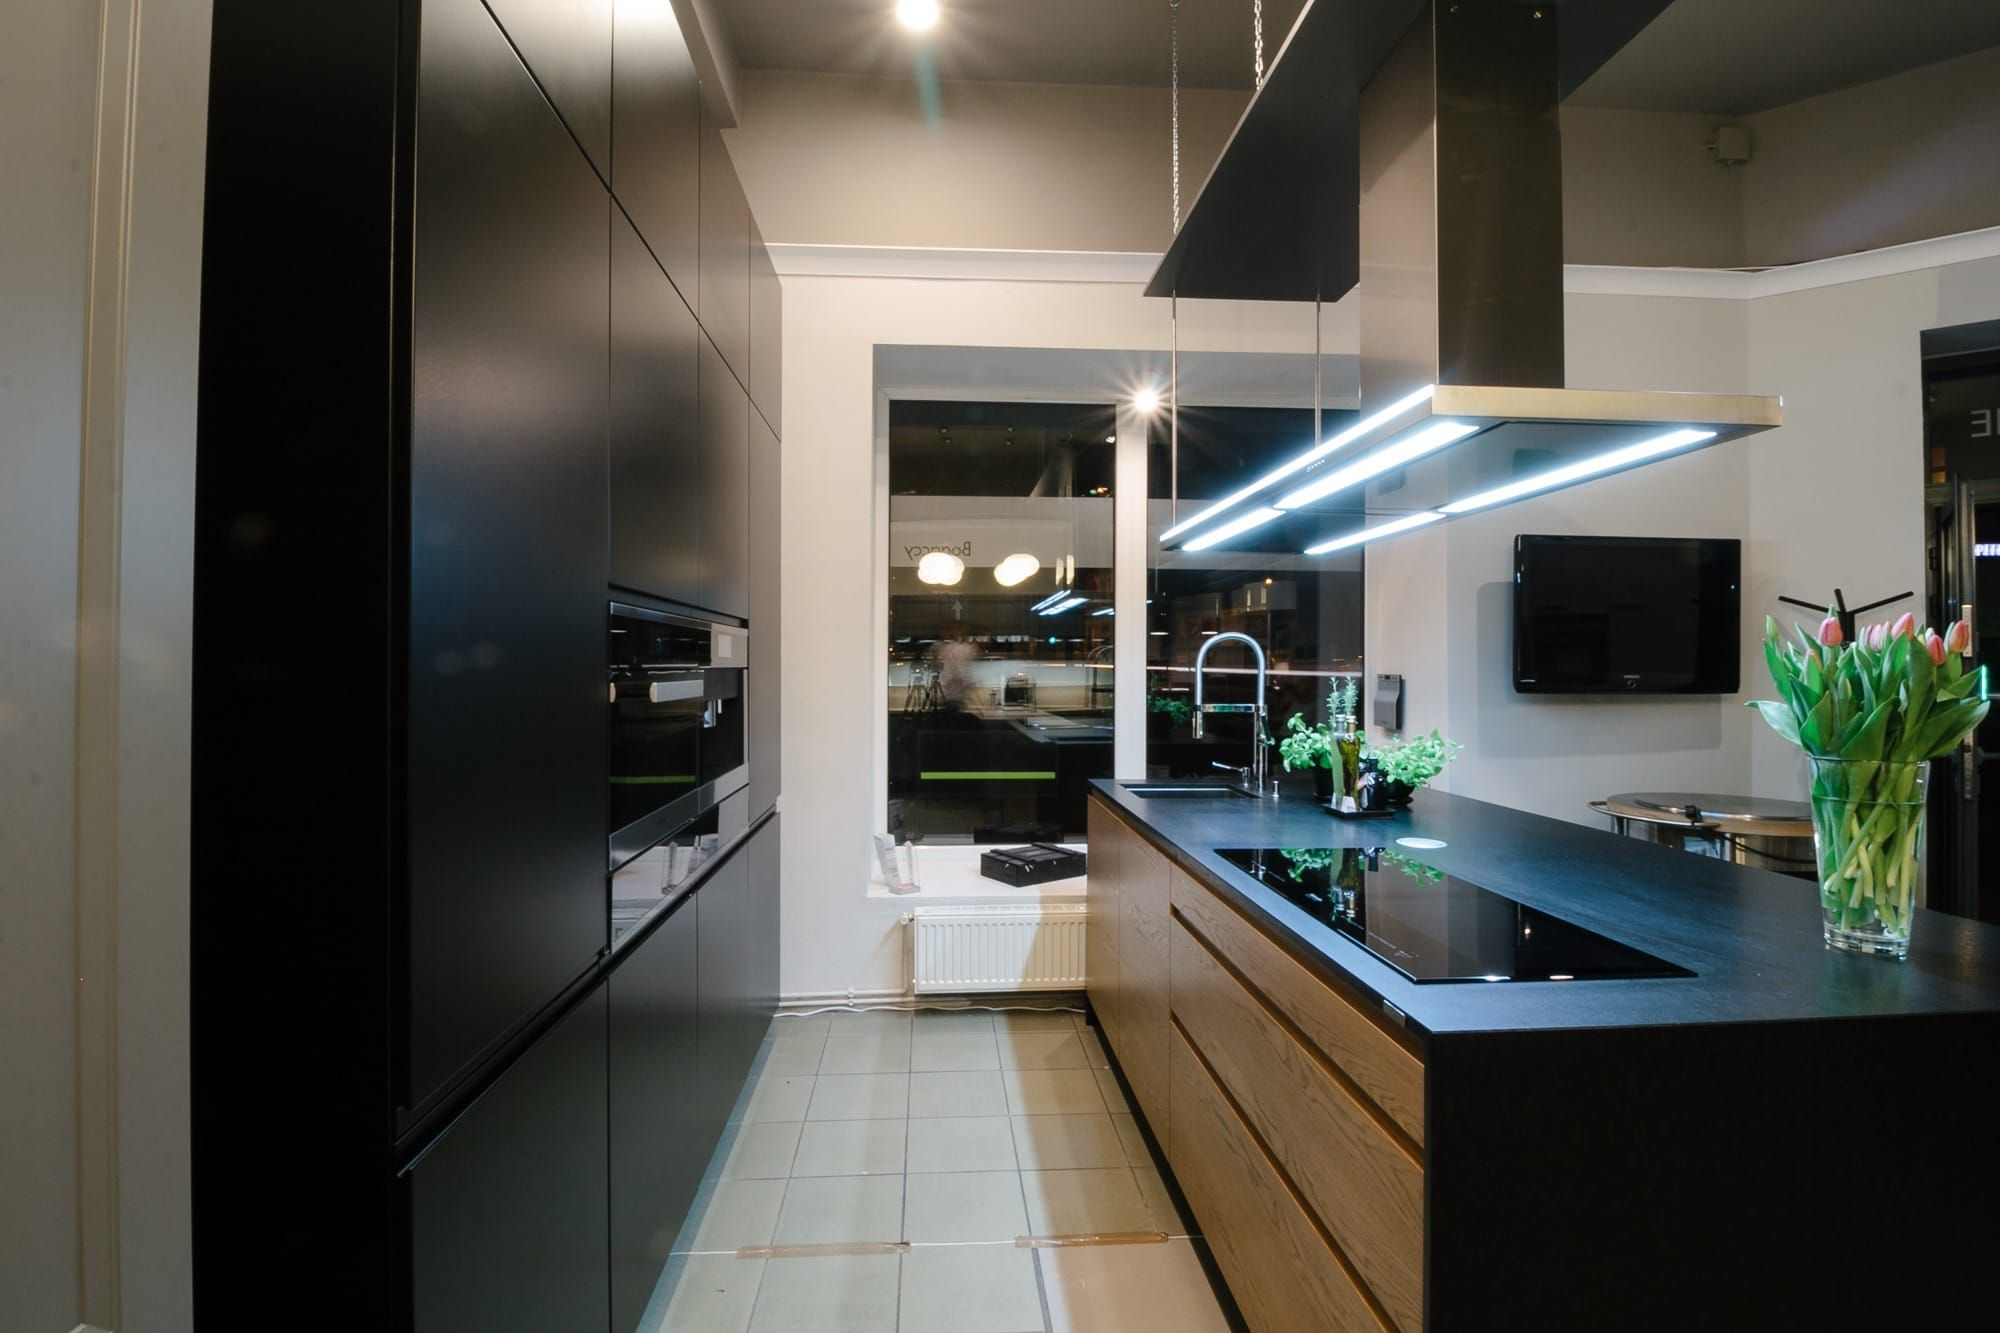 Modern Kitchen Nowoczesna Kuchnia Home Home Decor Lighted Bathroom Mirror